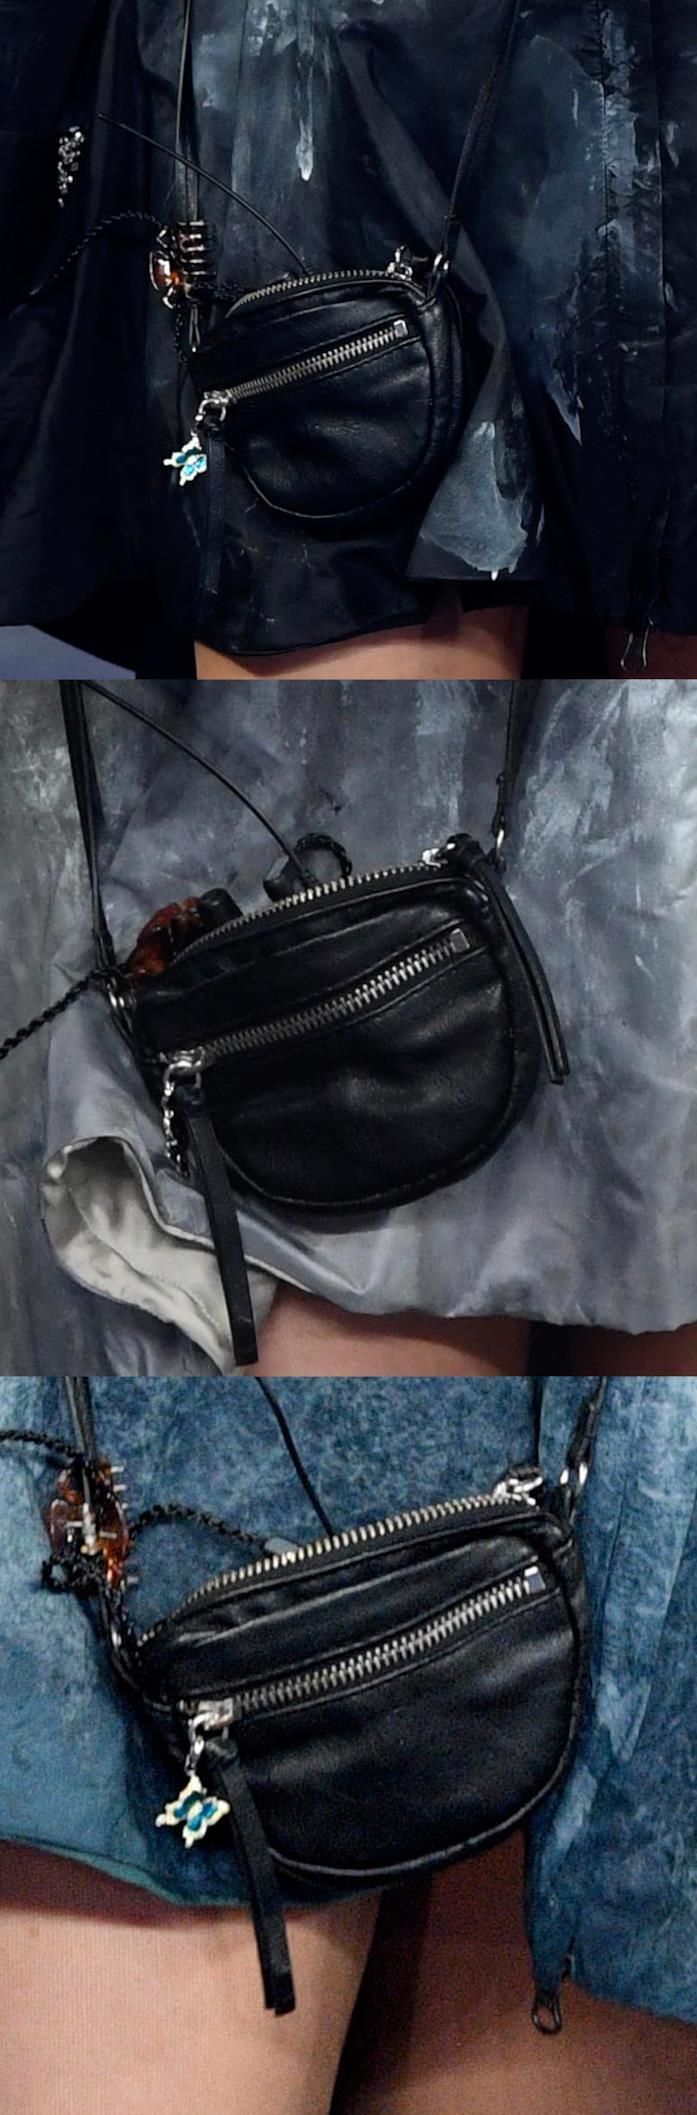 Loredana Bertè borsetta per tenere gli auricolari